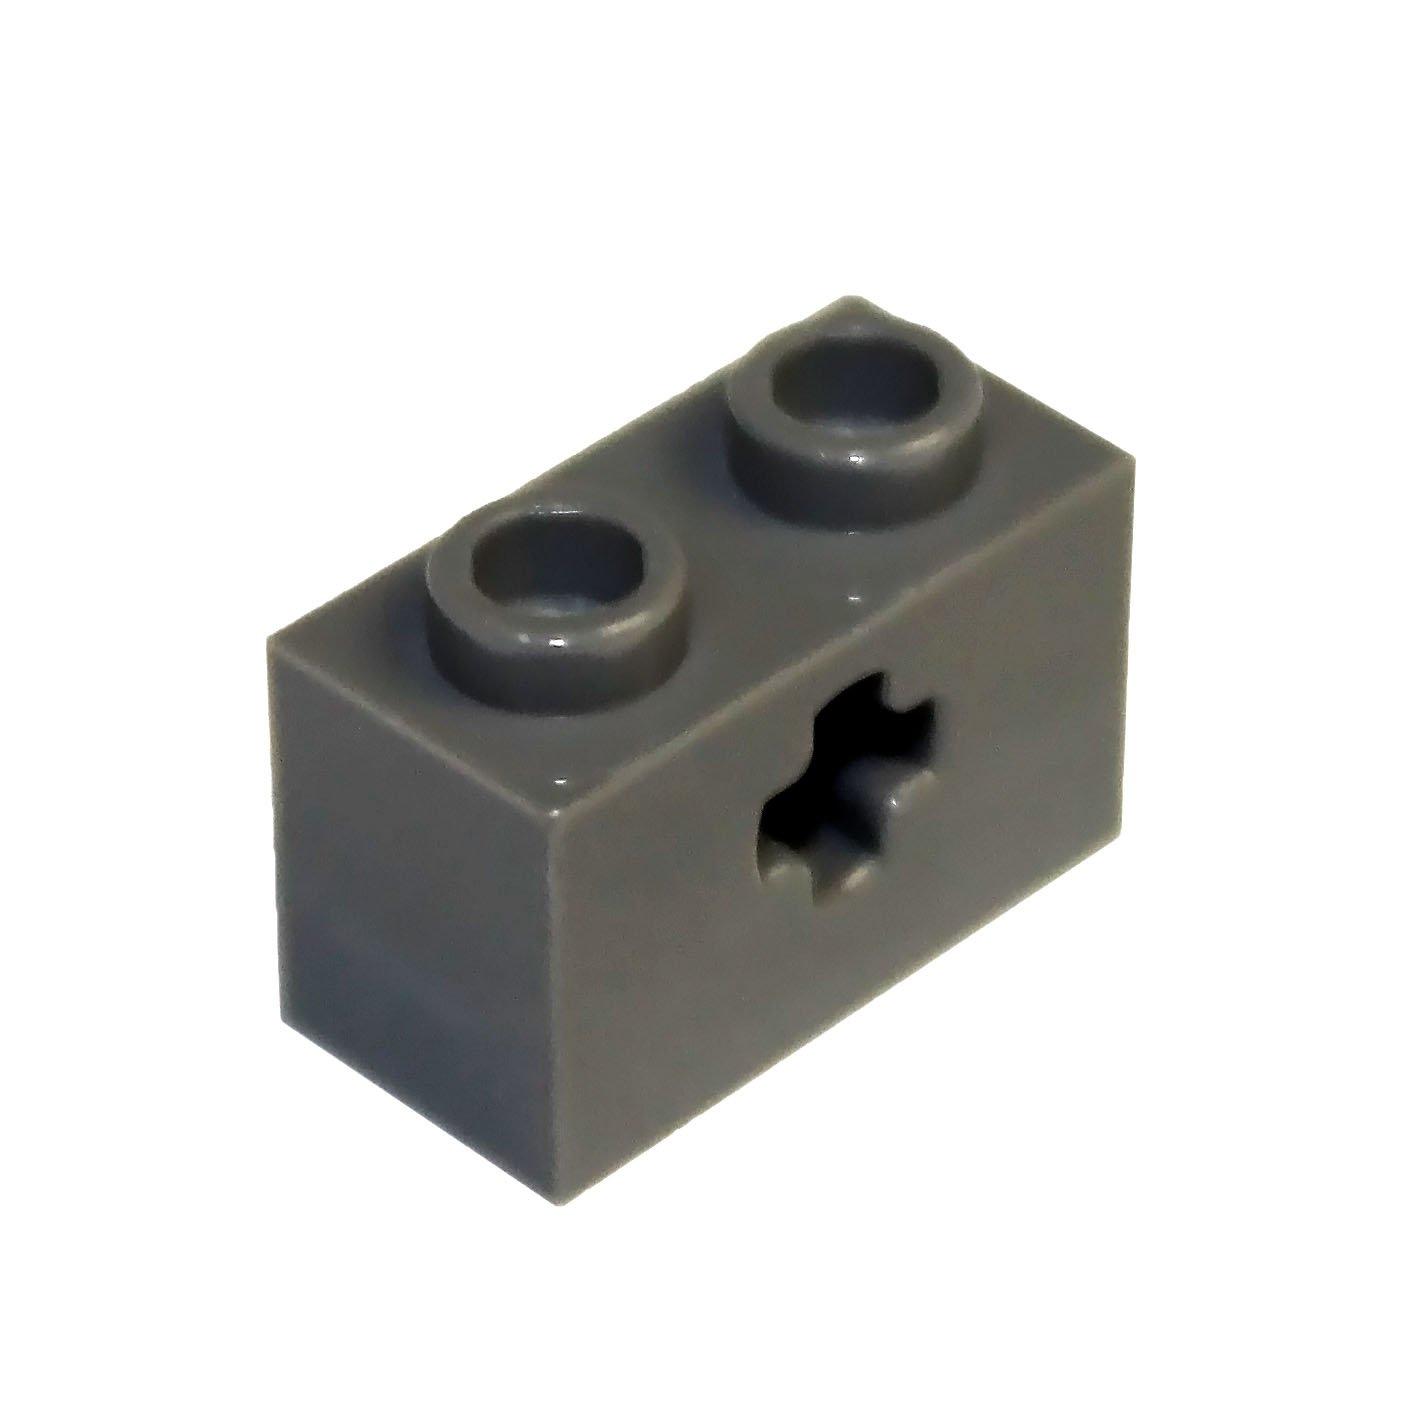 LEGO Lot of 10 Green 1x2 Technic Bricks with Axle Hole